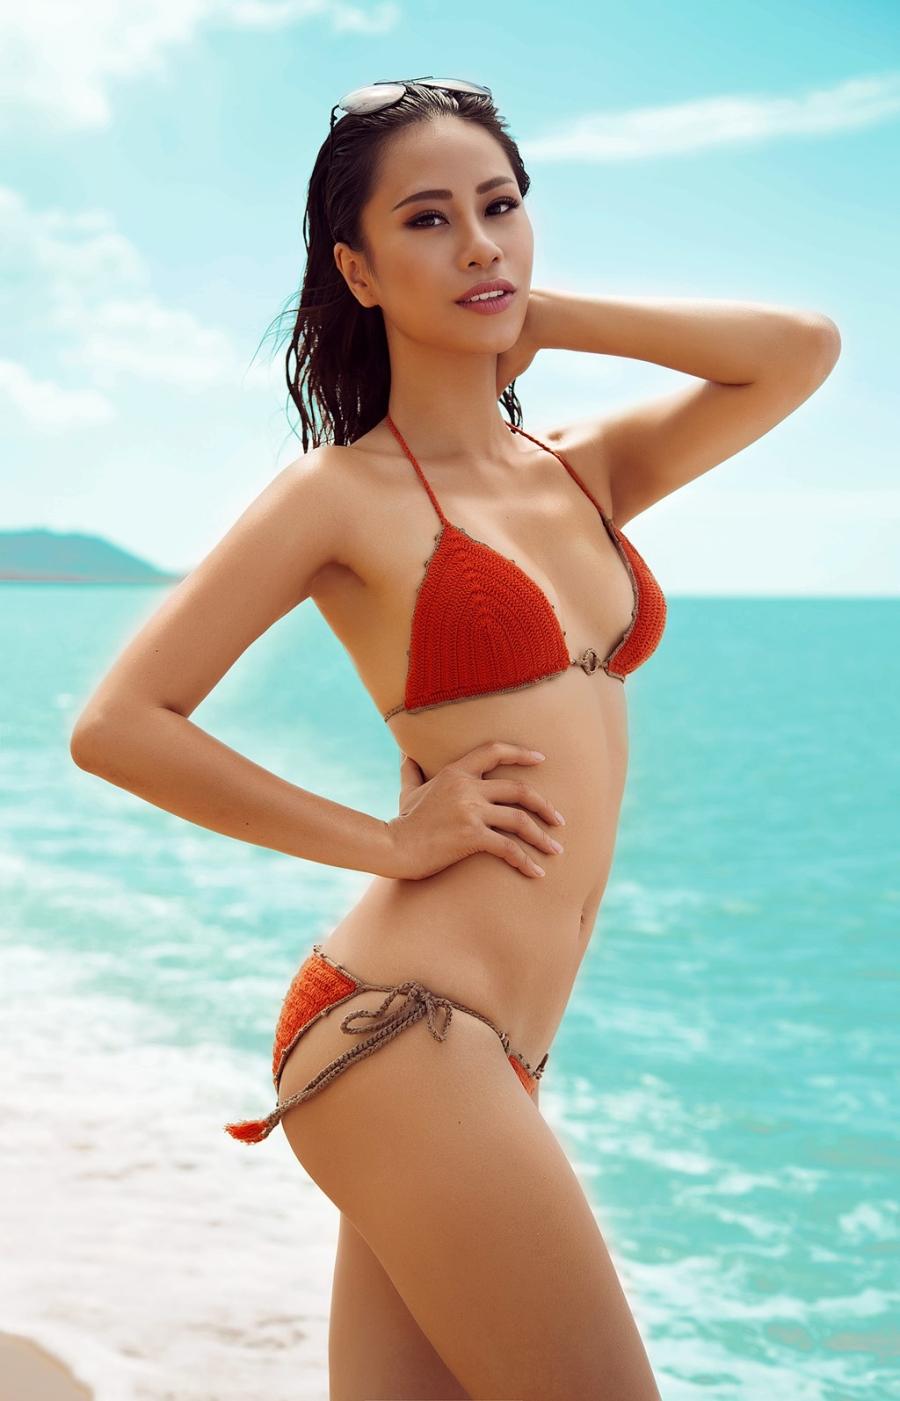 Ve nong bong cua nguoi dep Viet se thi Hoa hau The gioi 2016 hinh anh 6